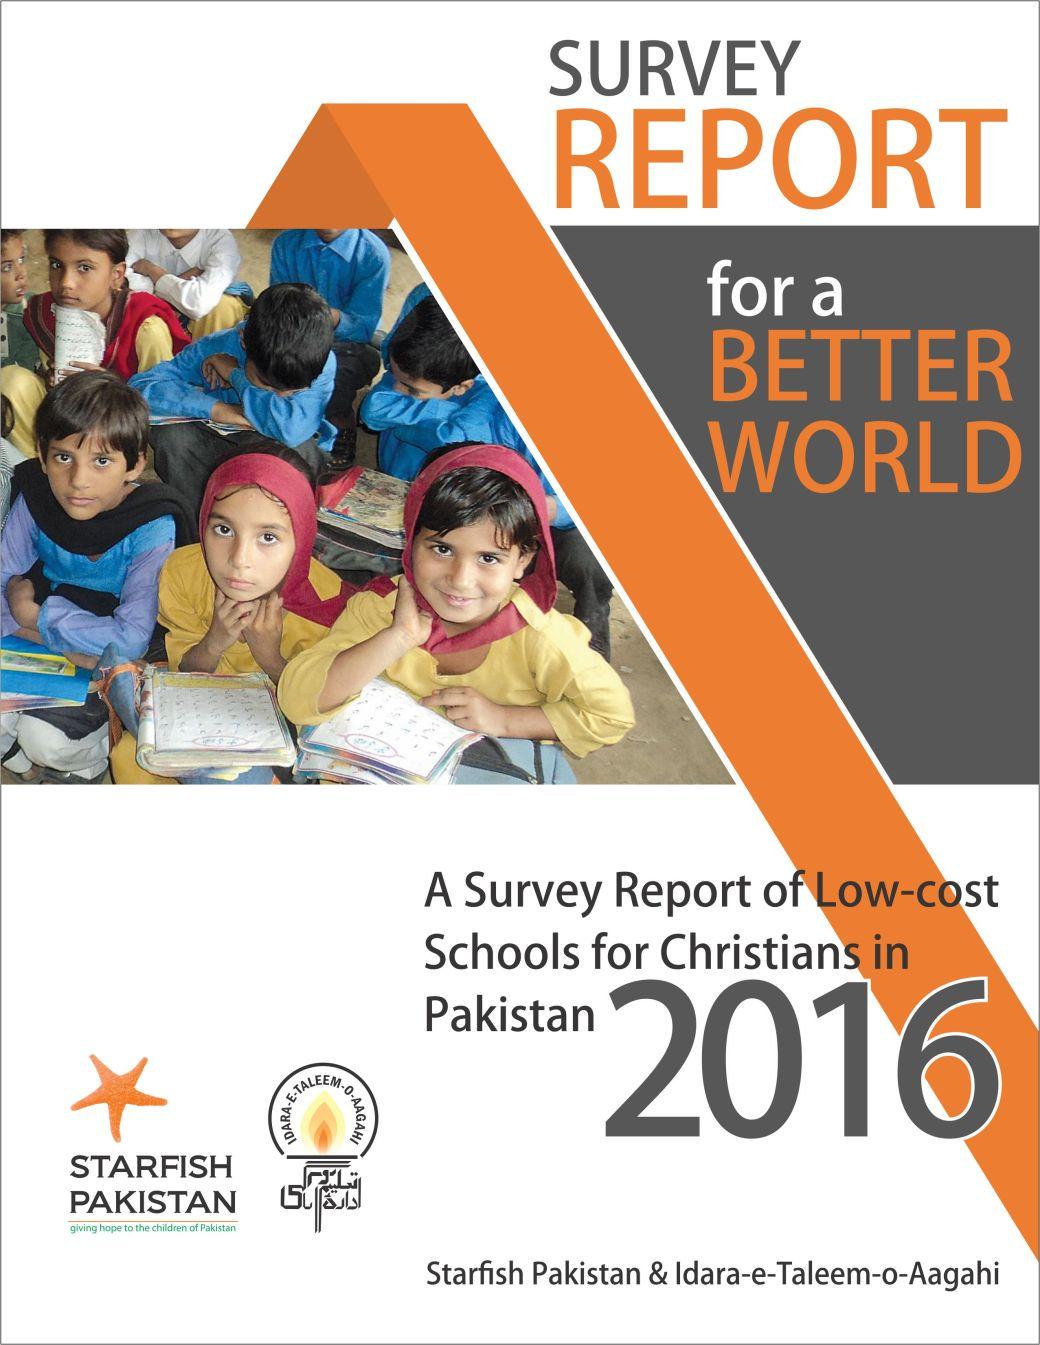 starfish-pakistan-report